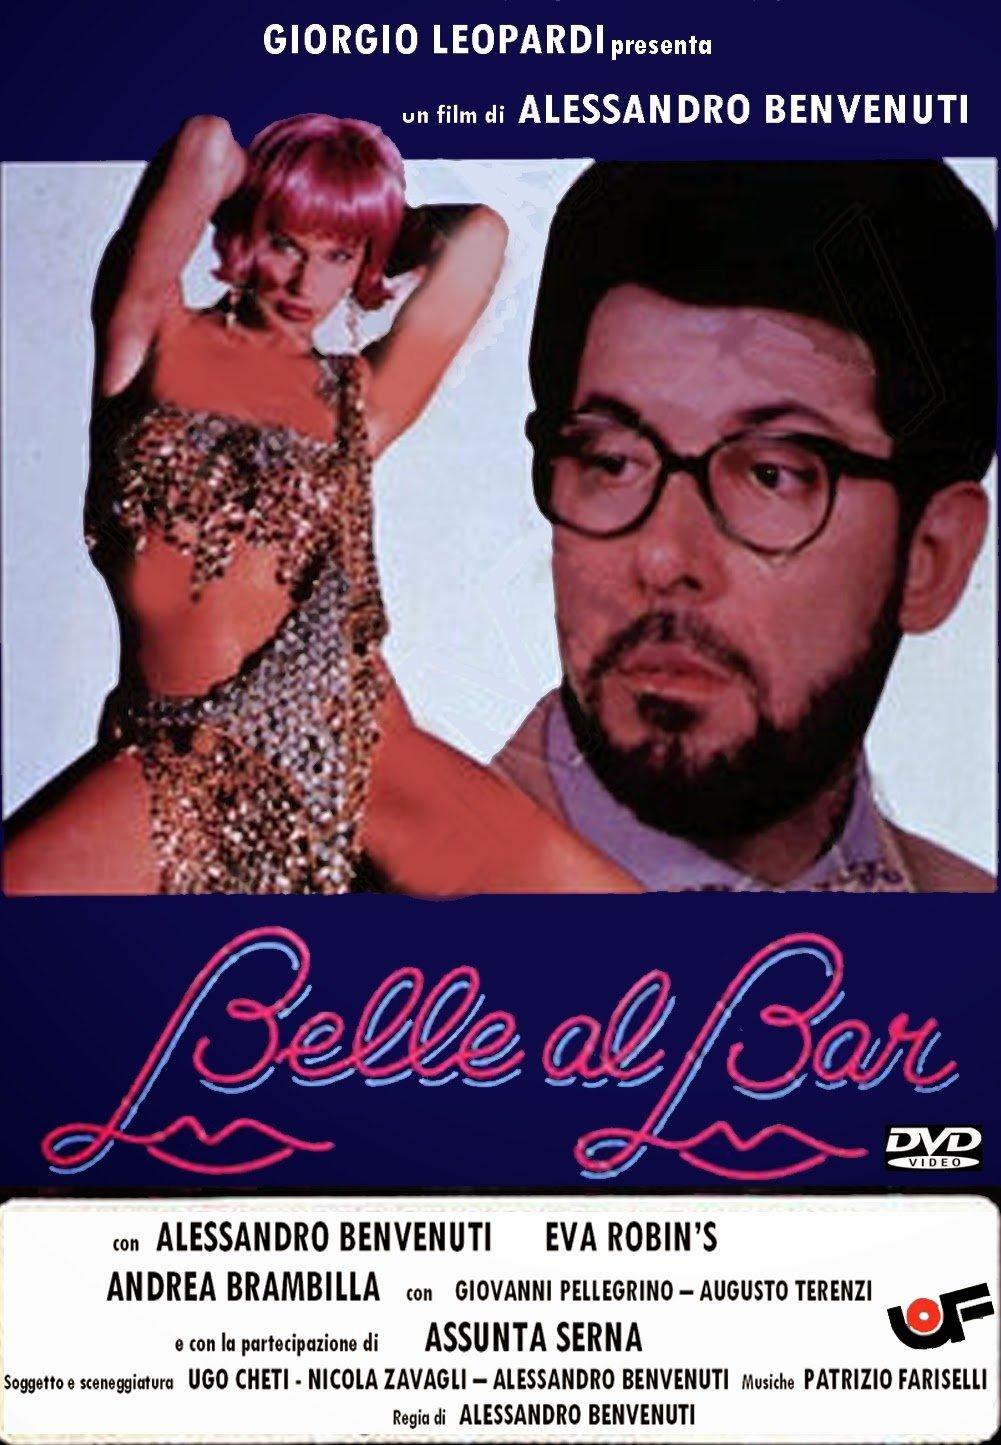 Watch Eva Robins (born 1958) video